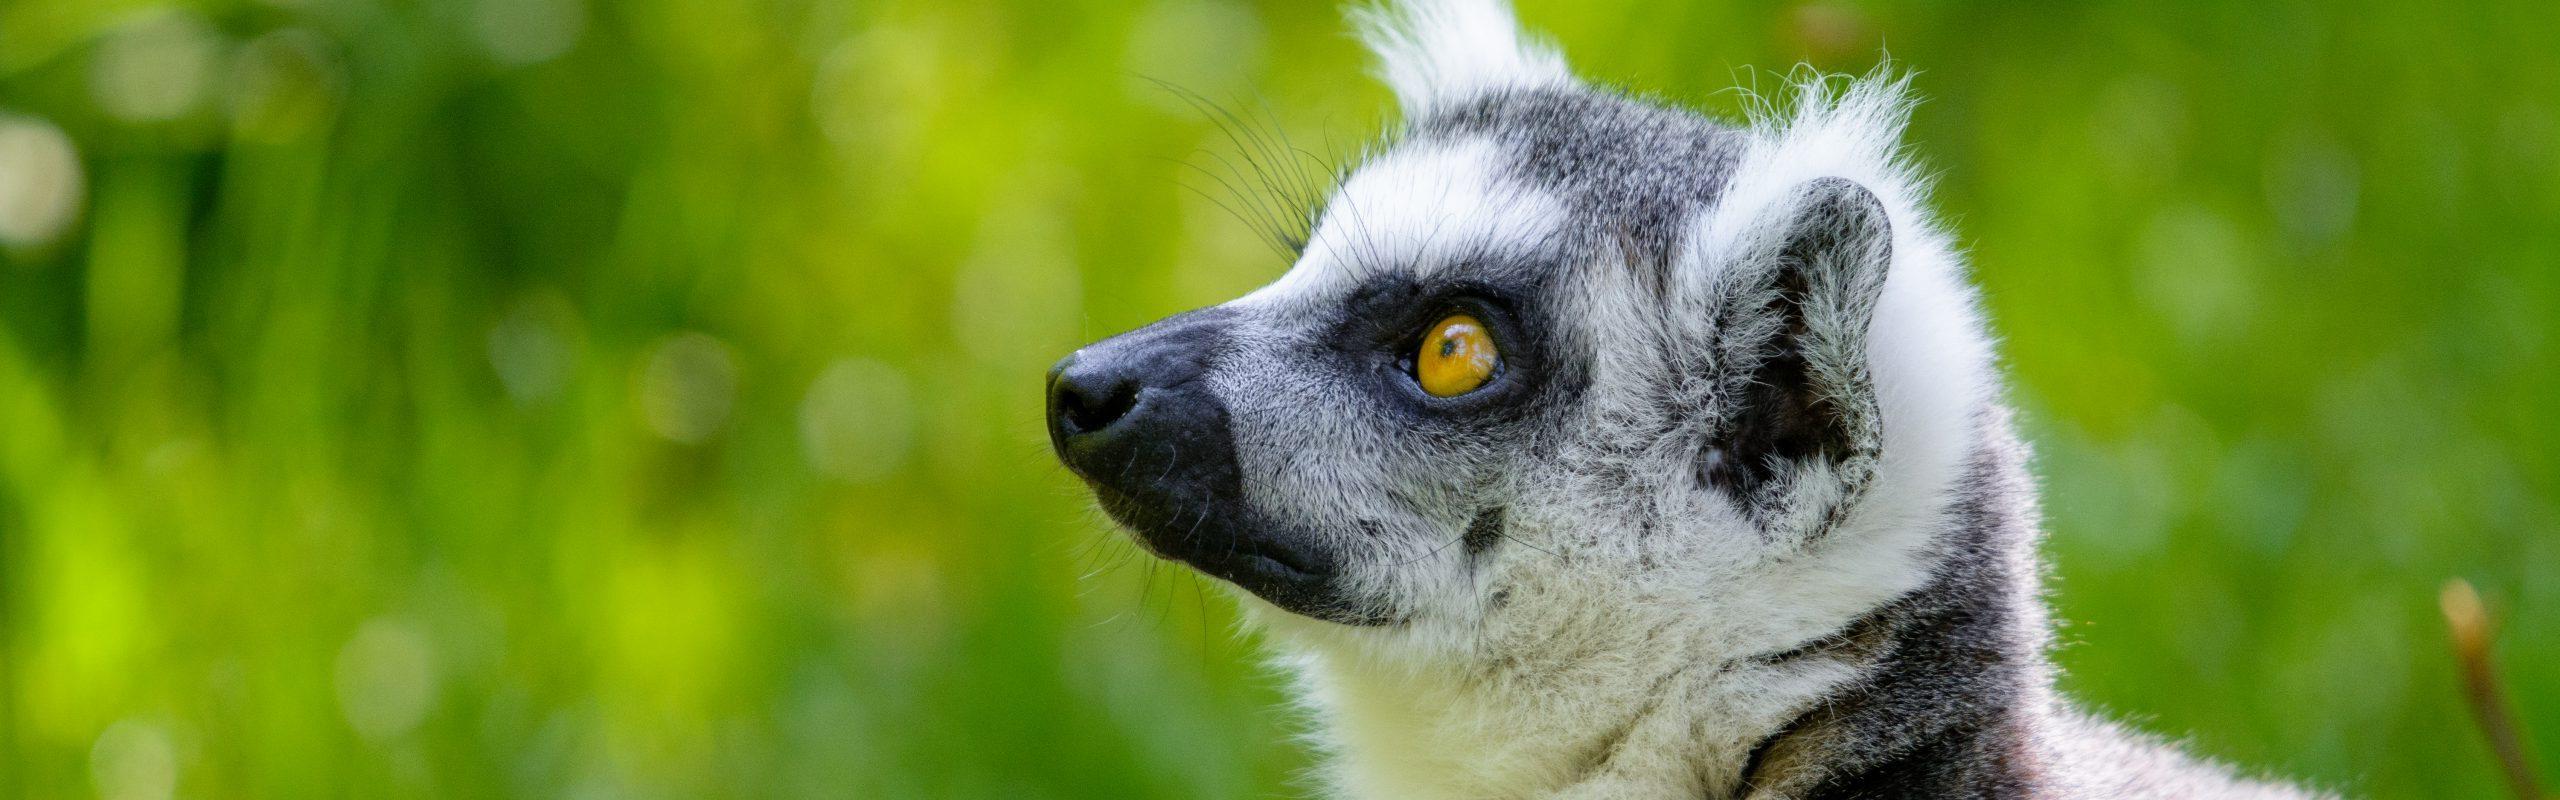 https://faunafocus.com/home/november-2018-ring-tailed-lemur/#jp-carousel-11935